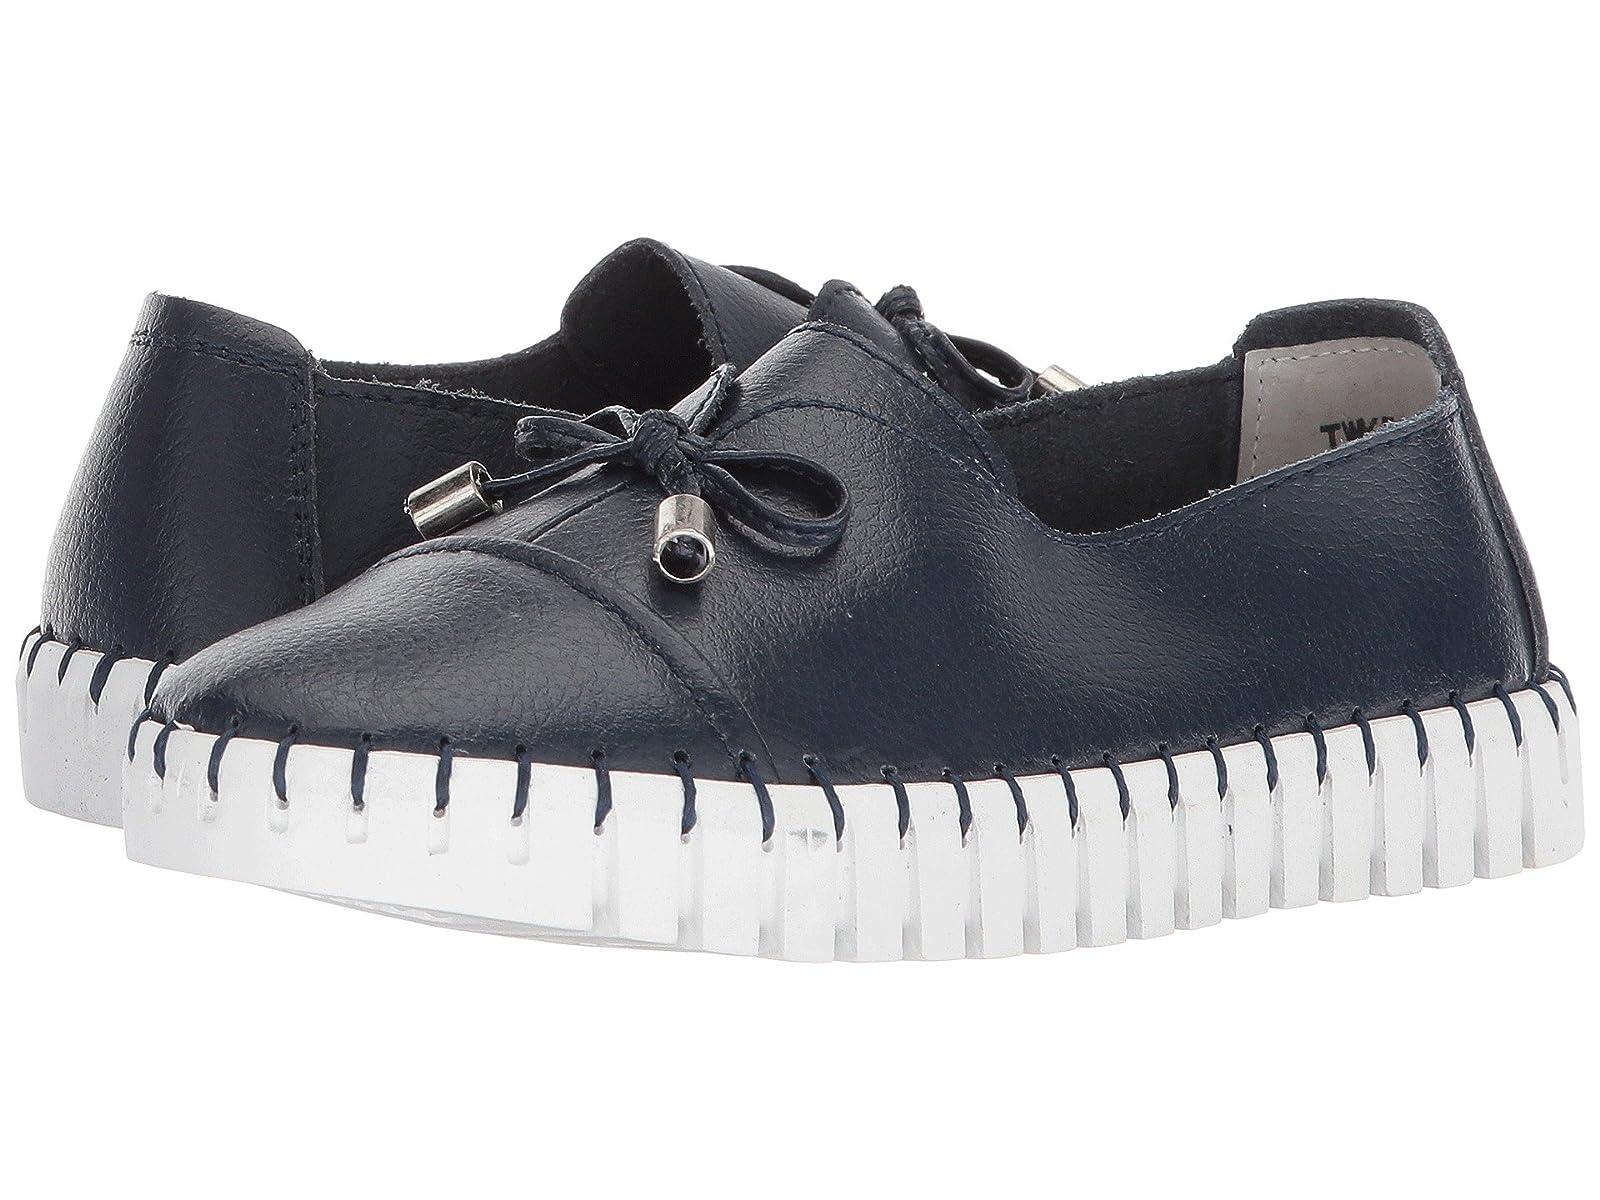 bernie mev. Kids Twk50 (Little Kid/Big Kid)Atmospheric grades have affordable shoes